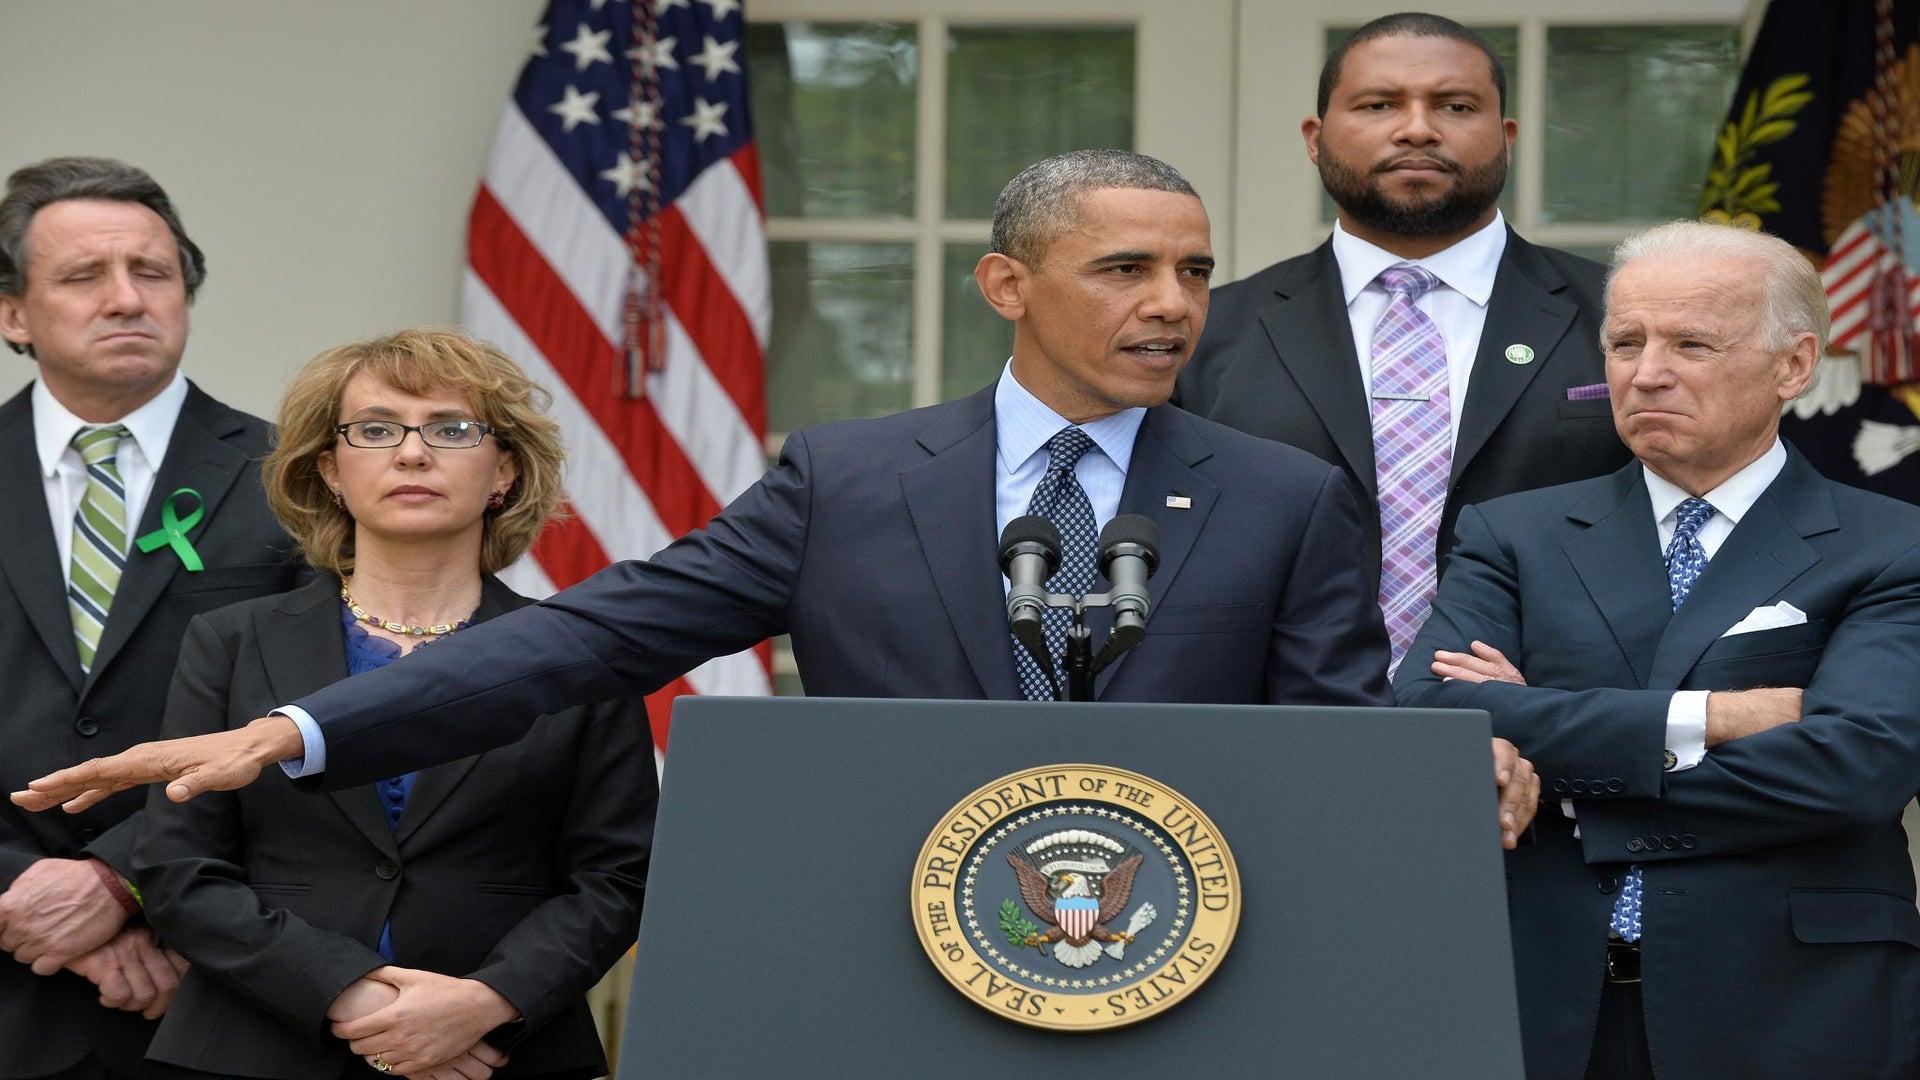 Senate Rejects Gun Bill, President Obama Reacts